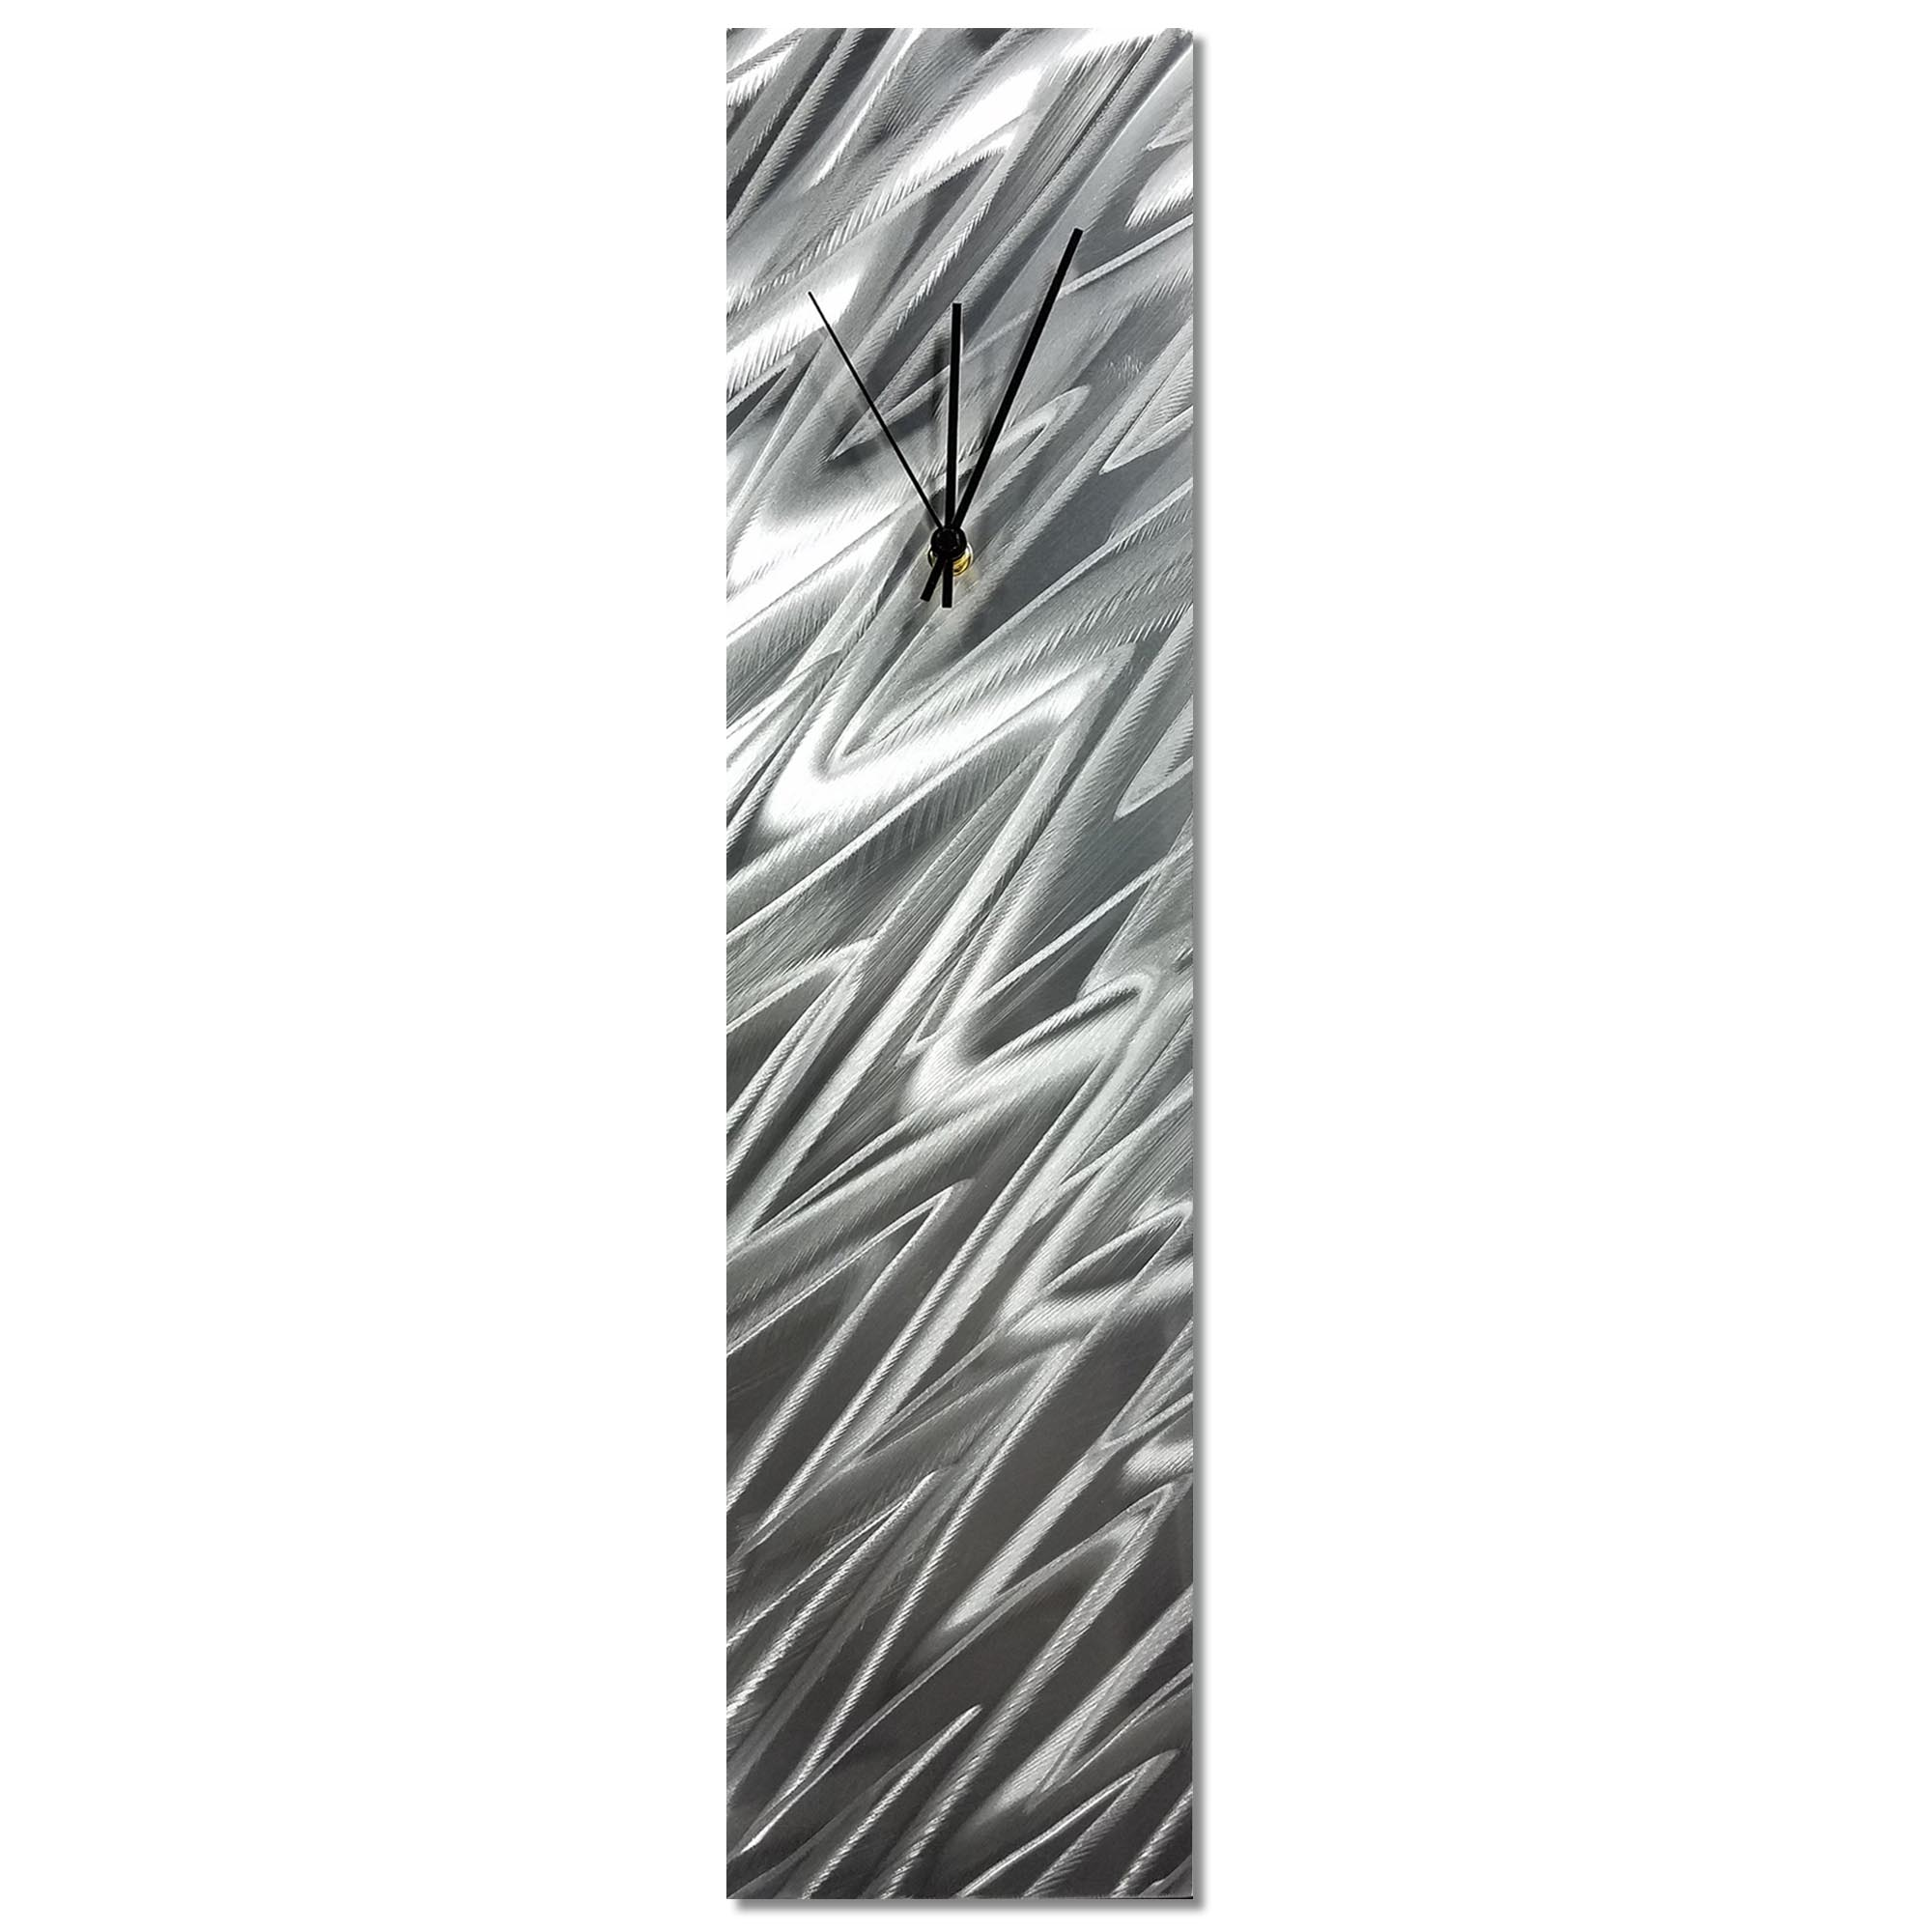 Silver Zig Zag Clock 6x24in. Natural Aluminum